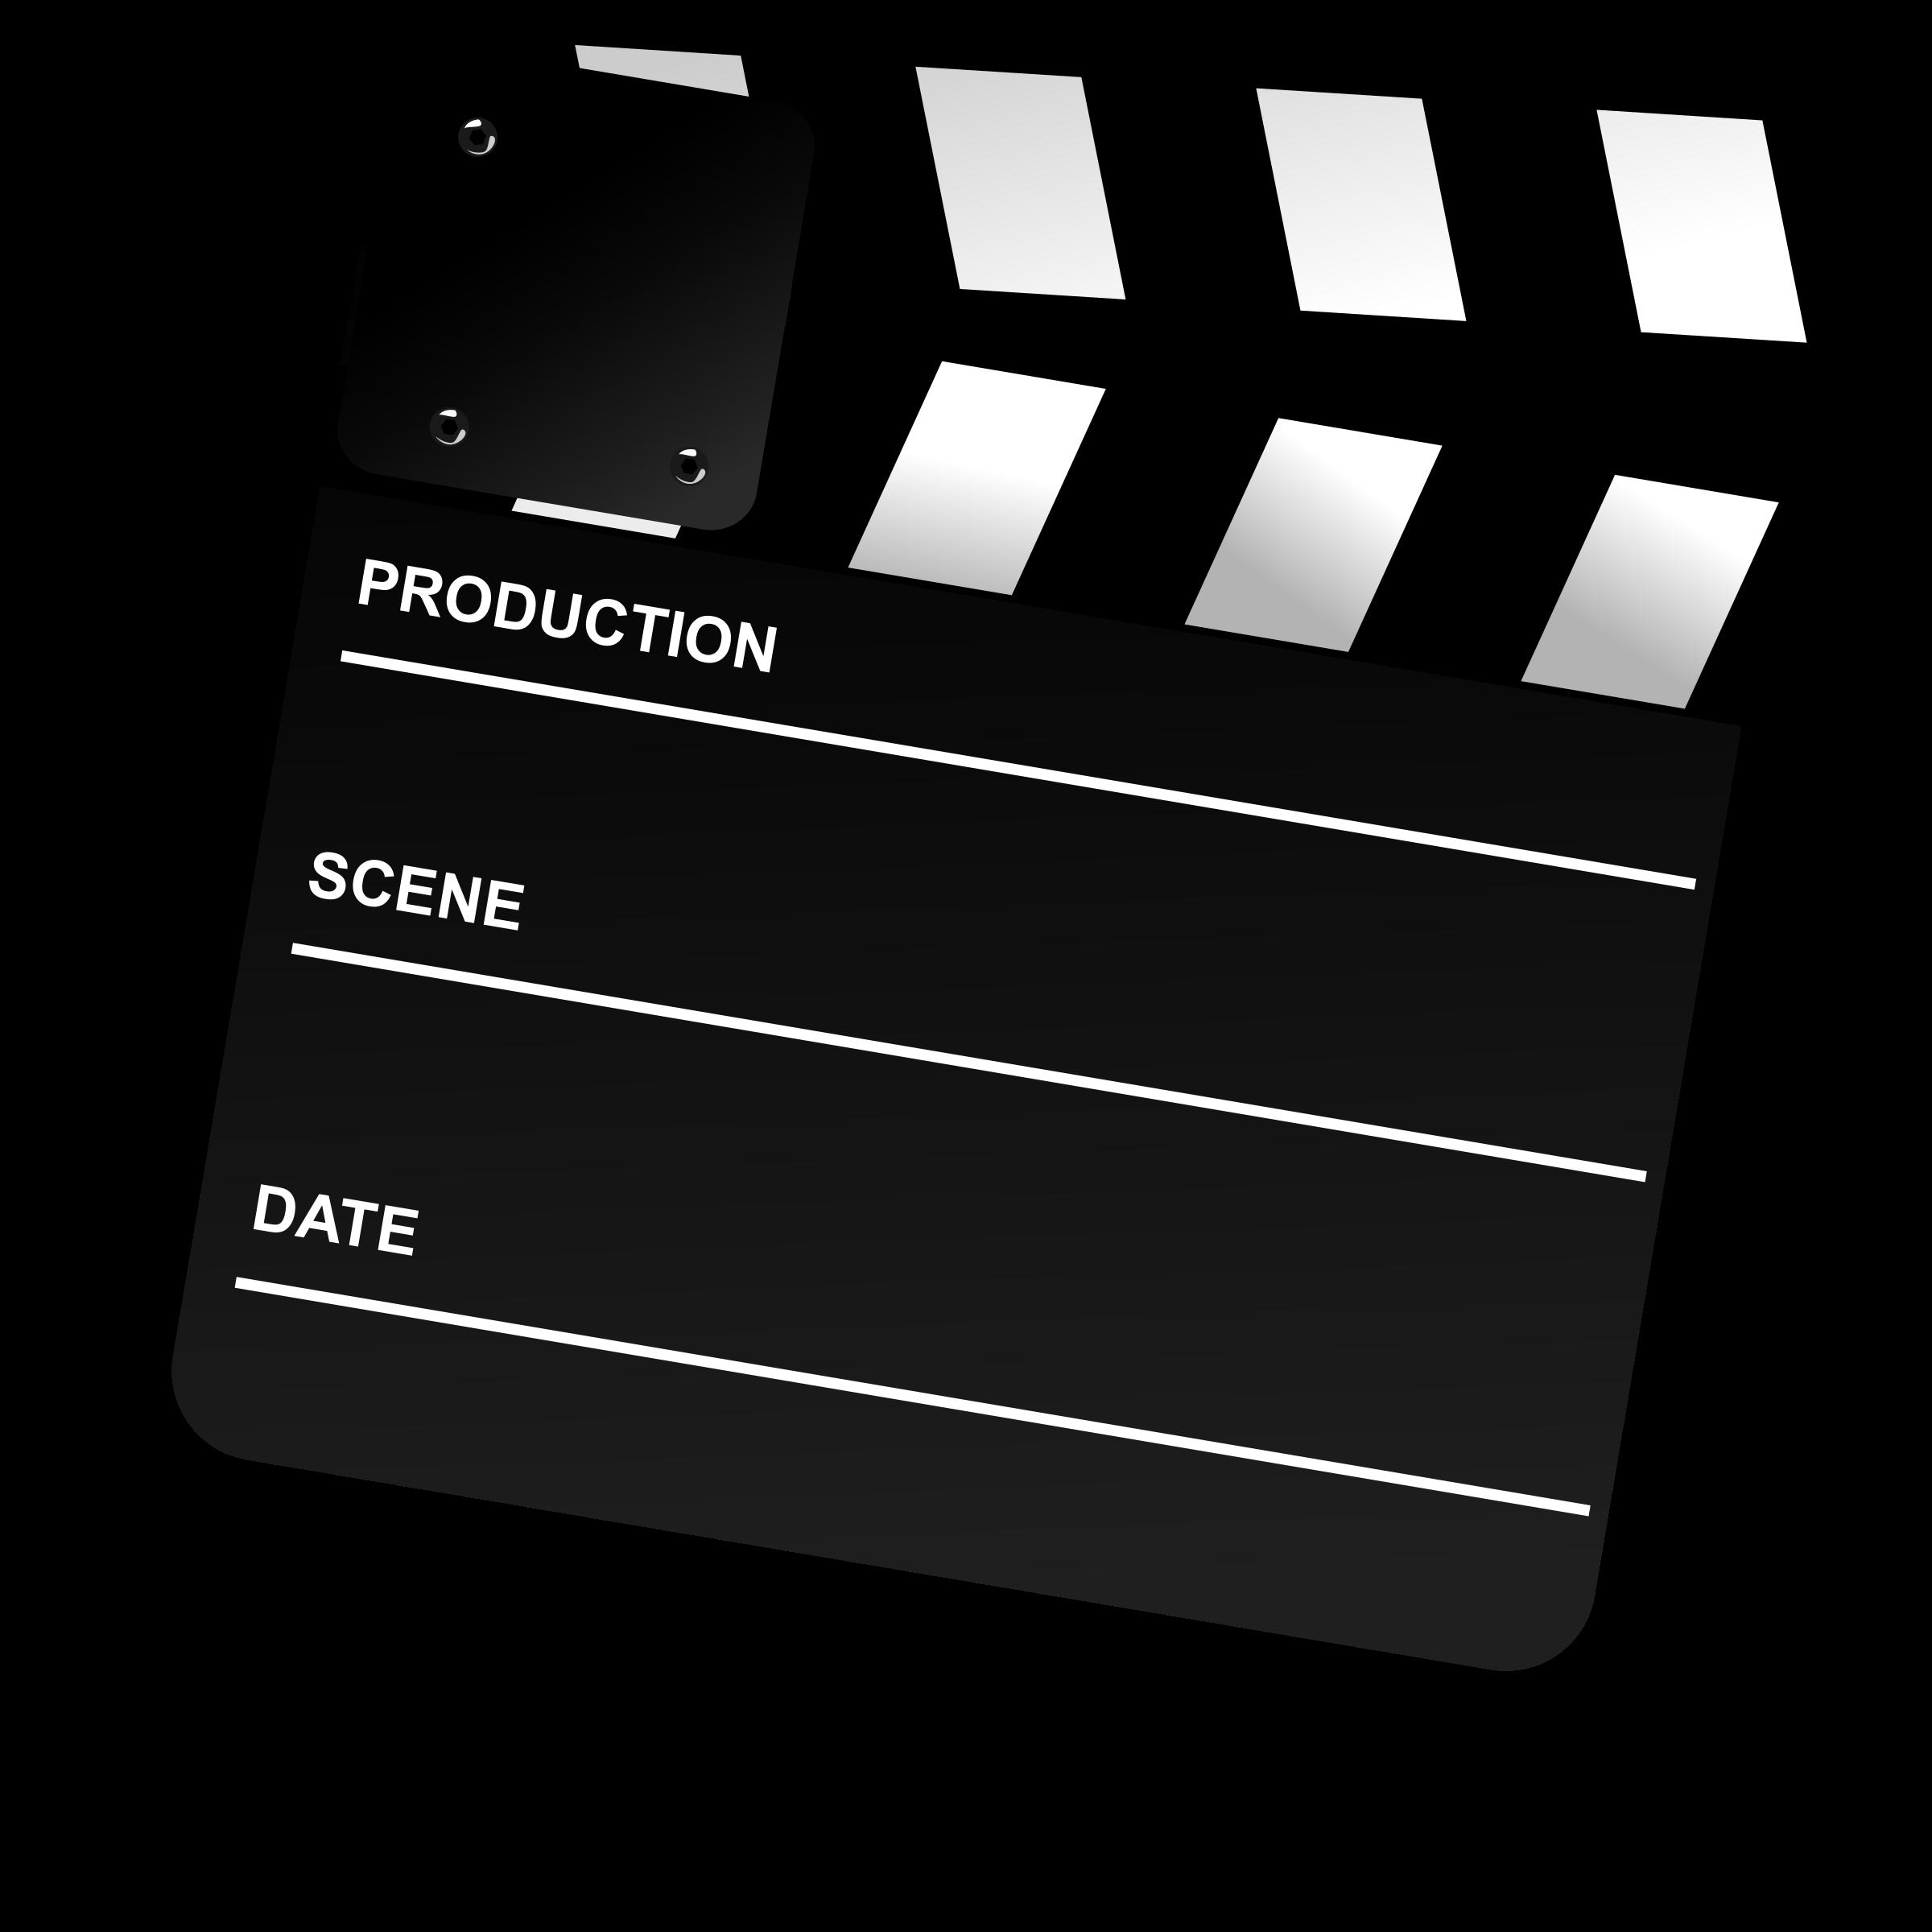 Movie night clip art 9 2